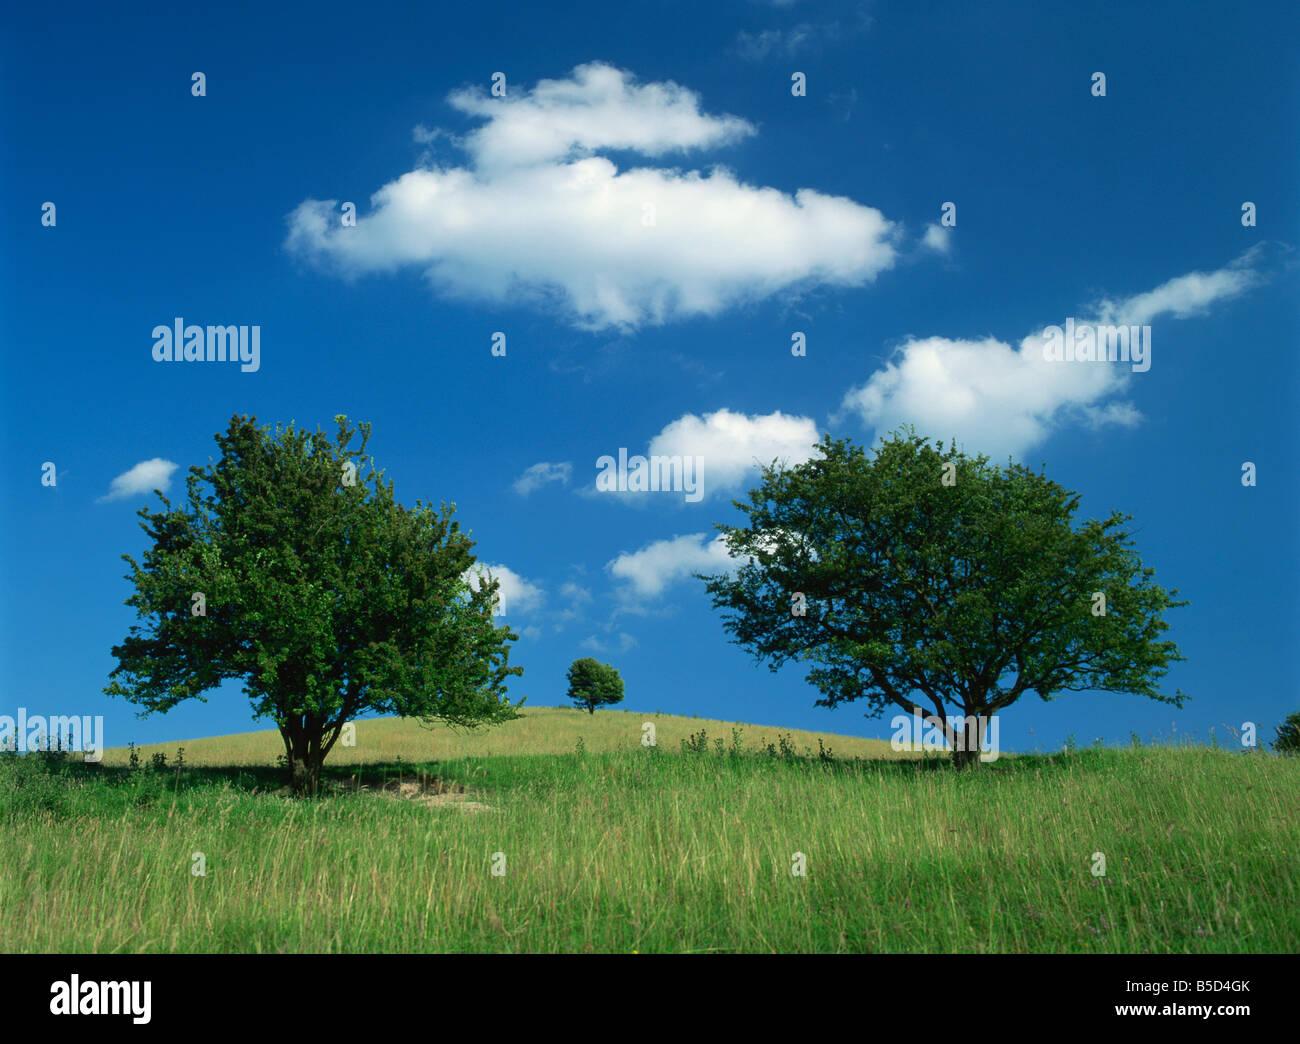 Tumuli Pitstone Hill beside the Chilterns Ridgeway path Buckinghamshire England United Kingdom Europe - Stock Image